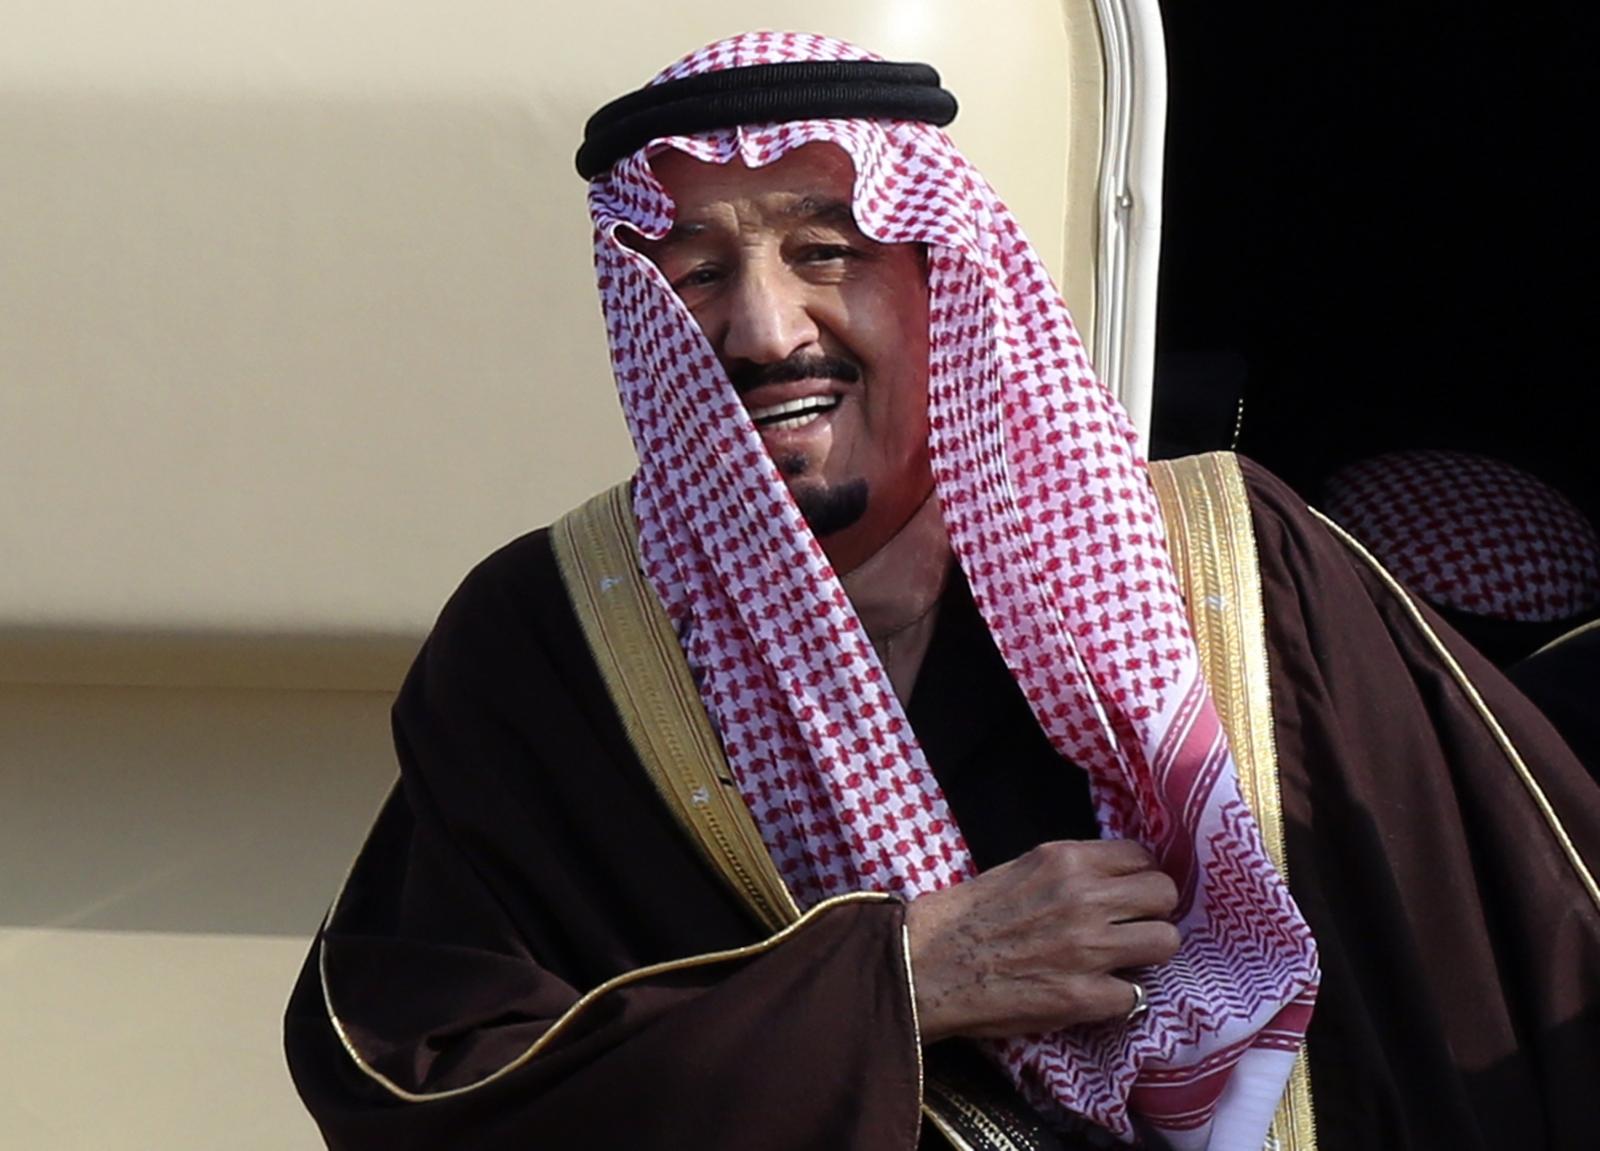 Saudi Arabia's new king Salman bin Abdul Aziz al-Saud